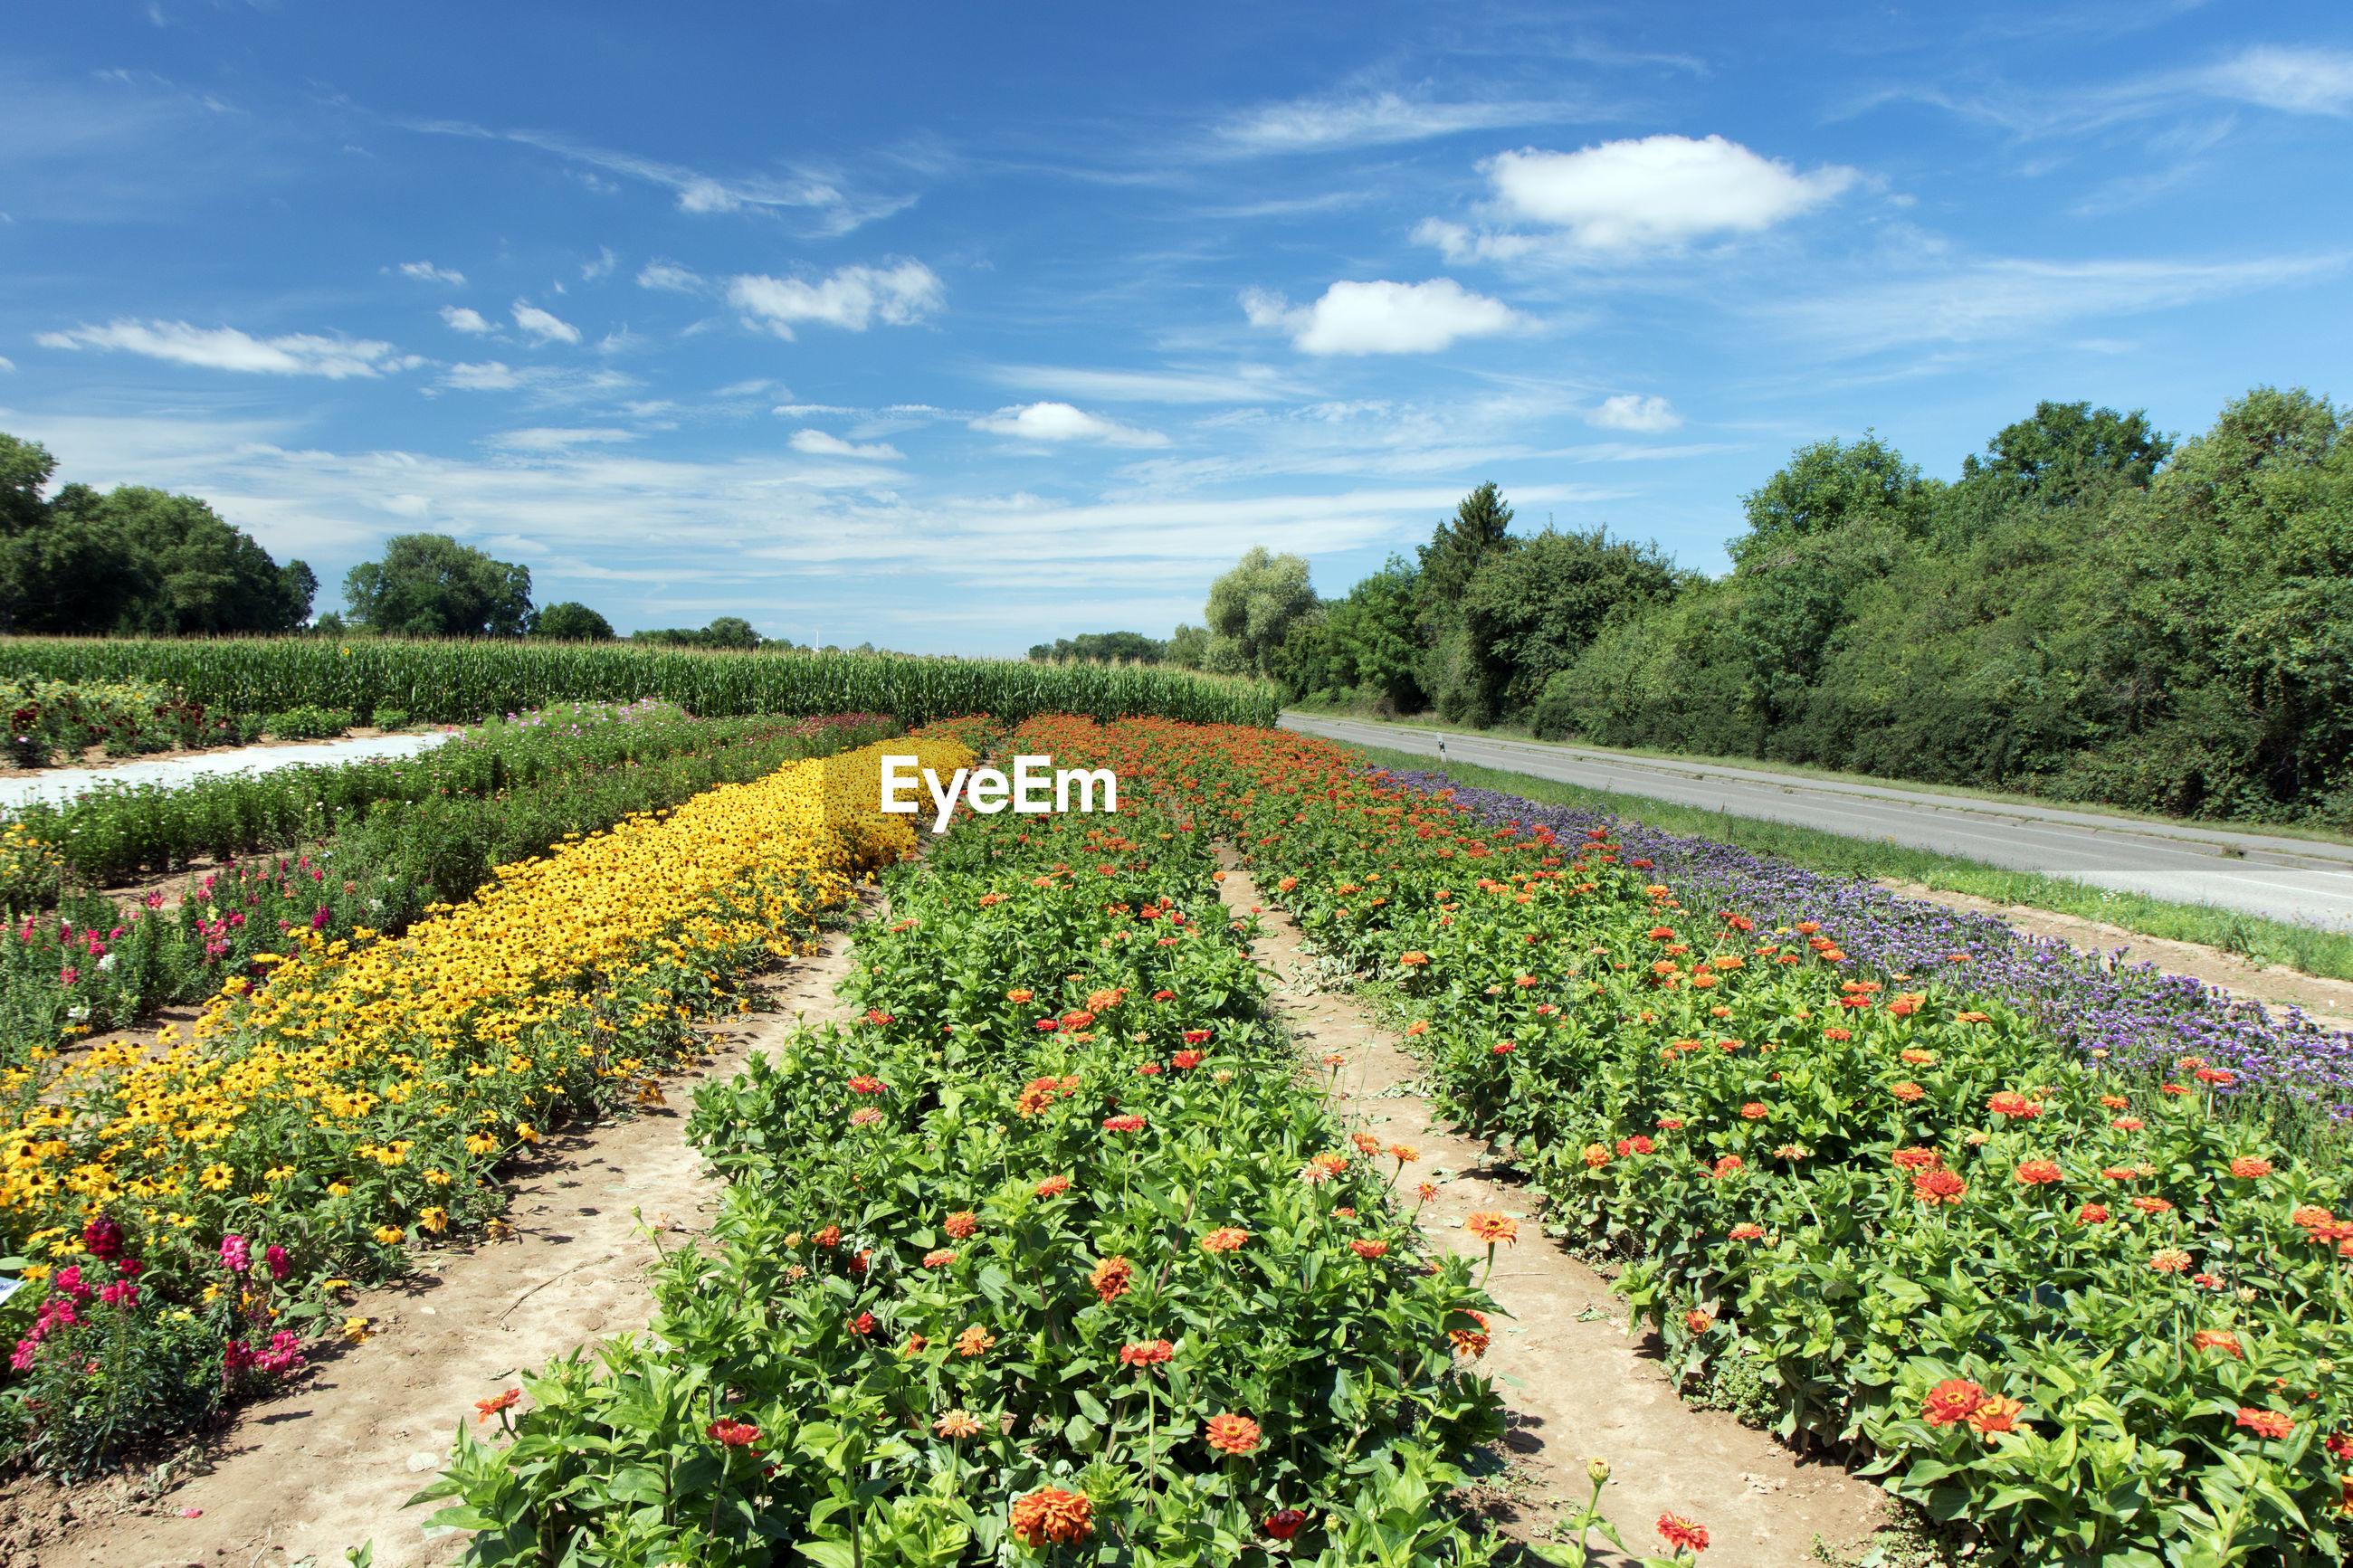 SCENIC VIEW OF FLOWERING FIELD AGAINST SKY